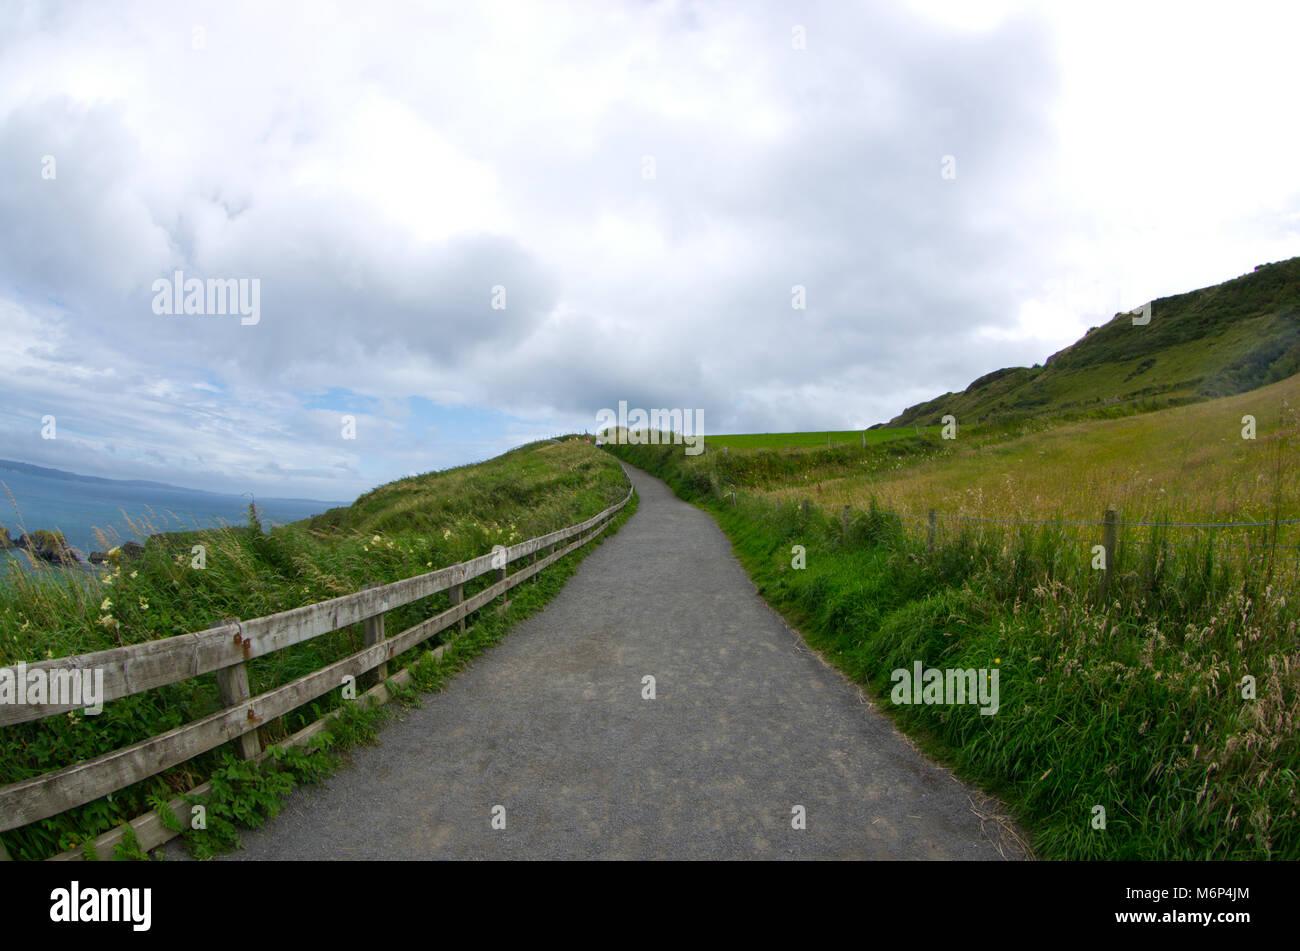 Giant's Causeway, Ireland - Stock Image